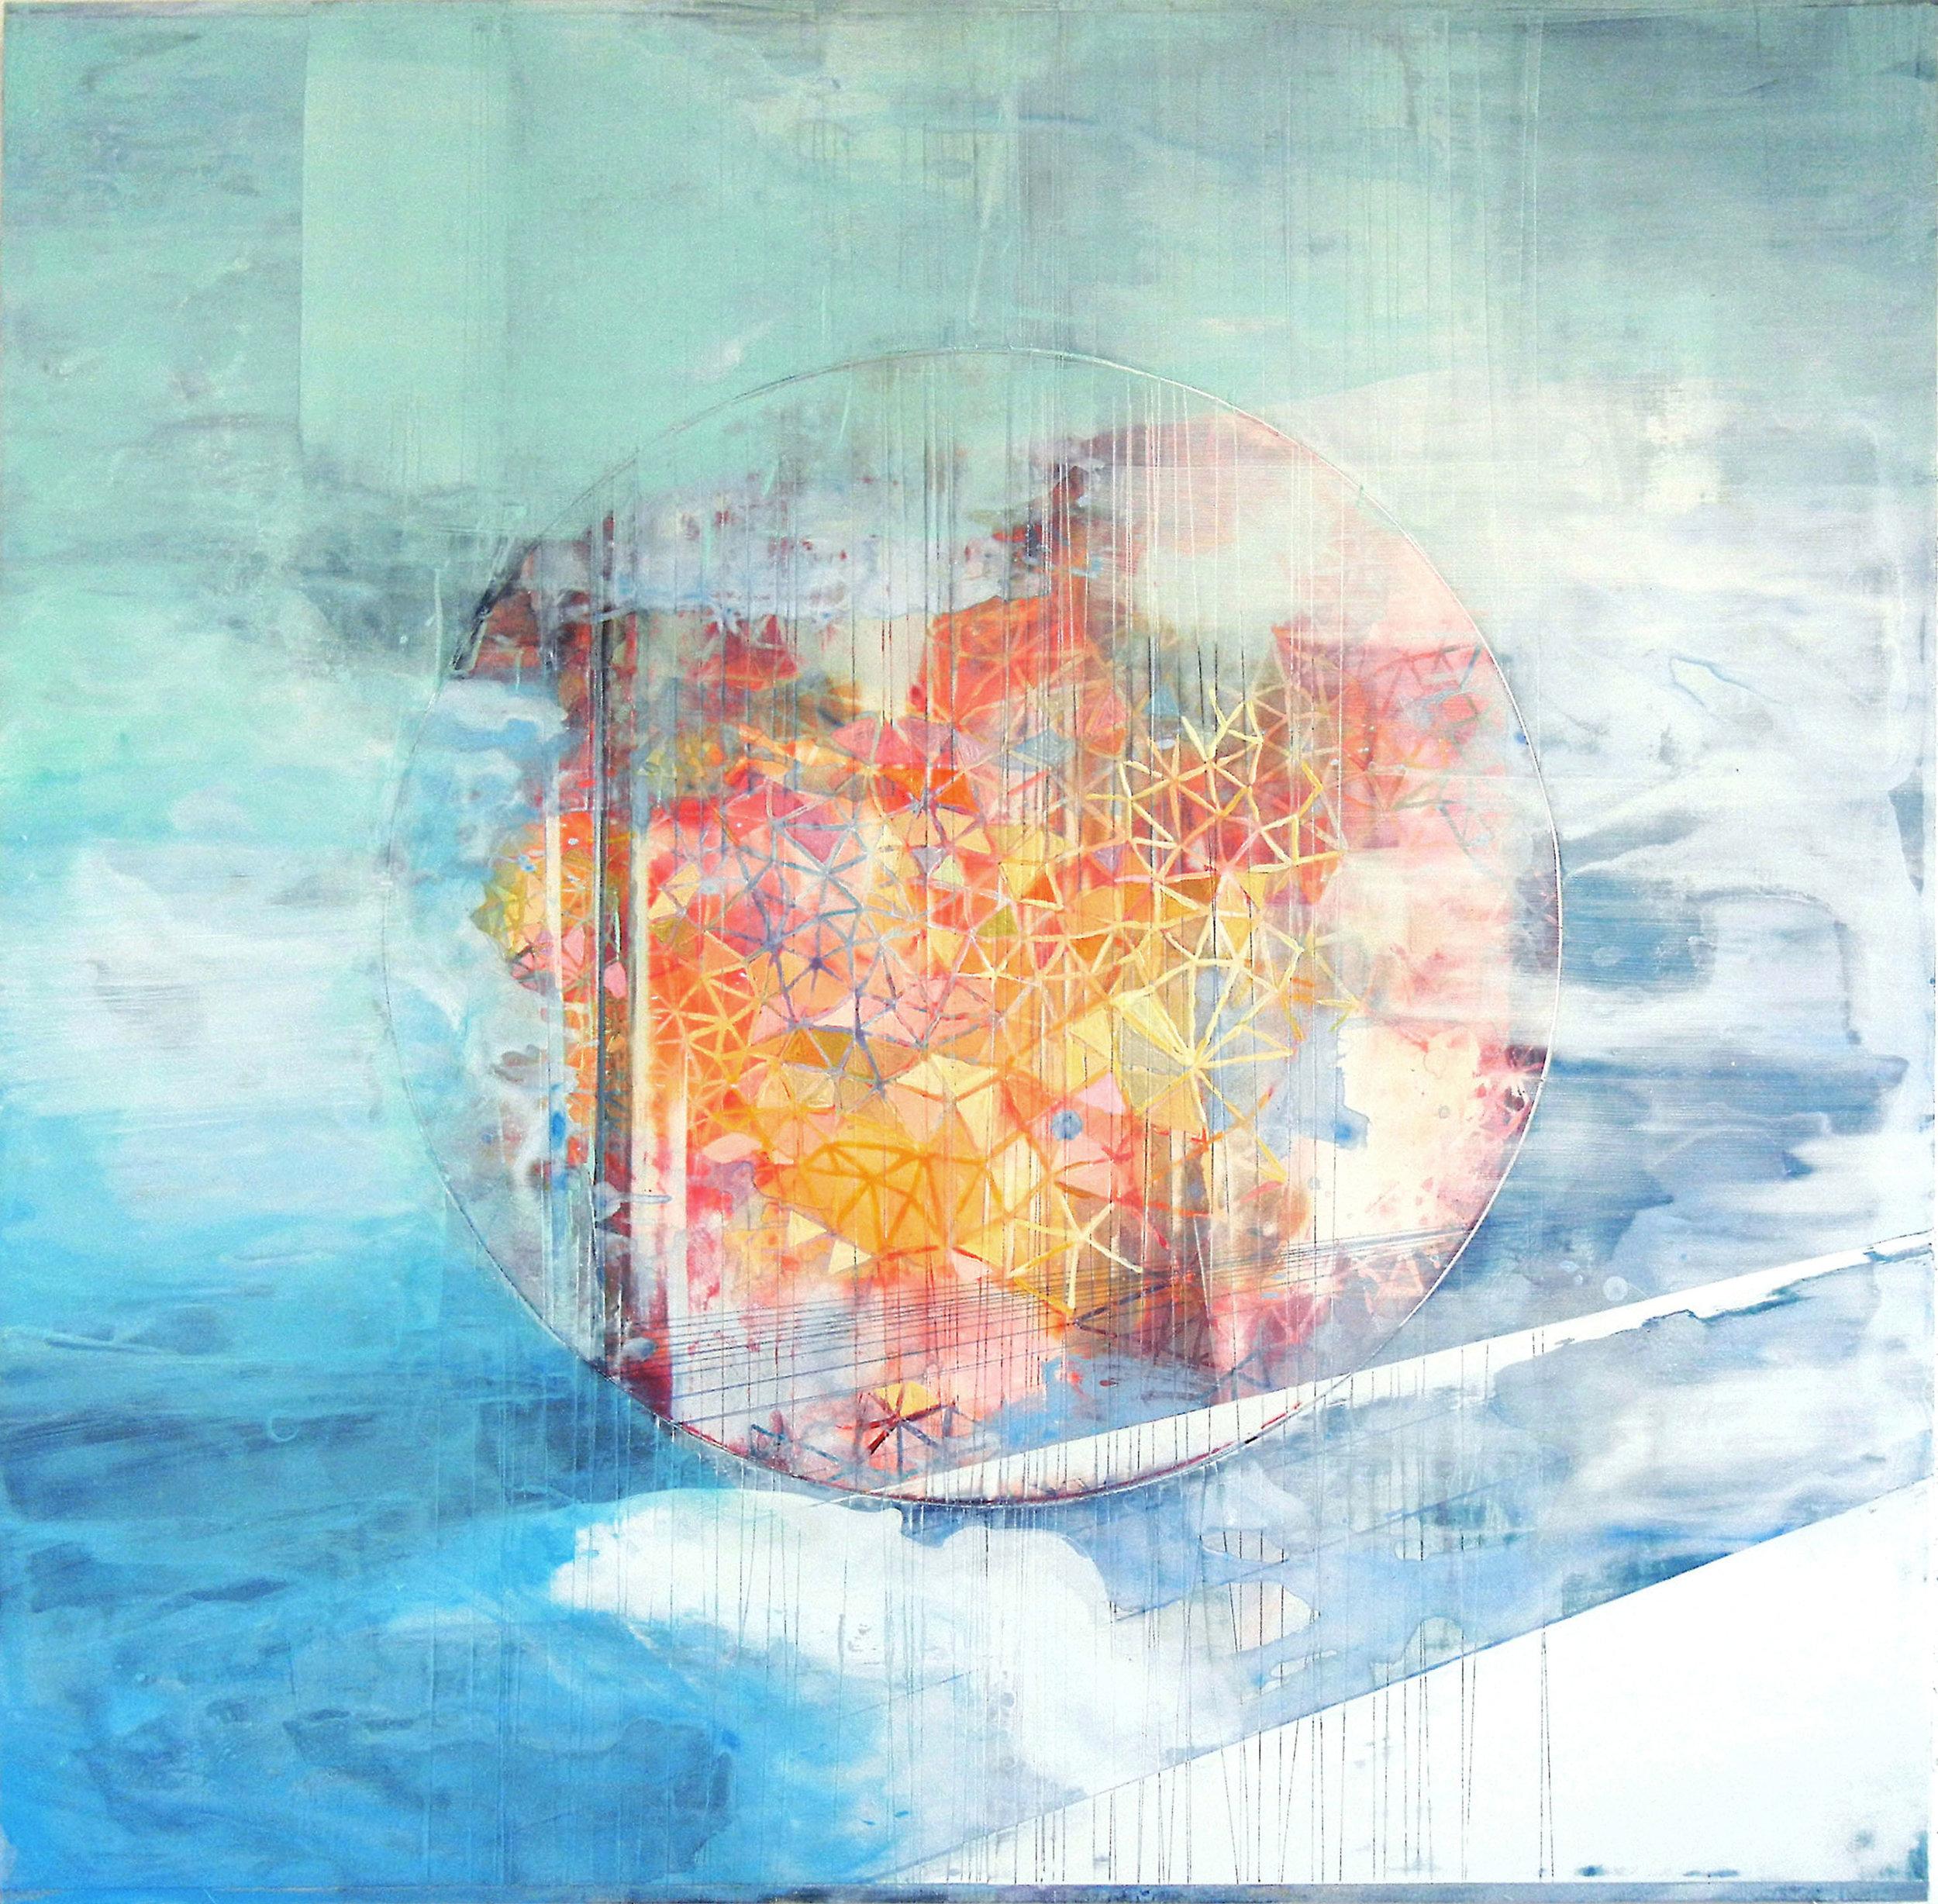 05_ dans l'air,éclaircie_2014_acrylic on paper and wooden panel_92cmx92cm_$3000 .jpg